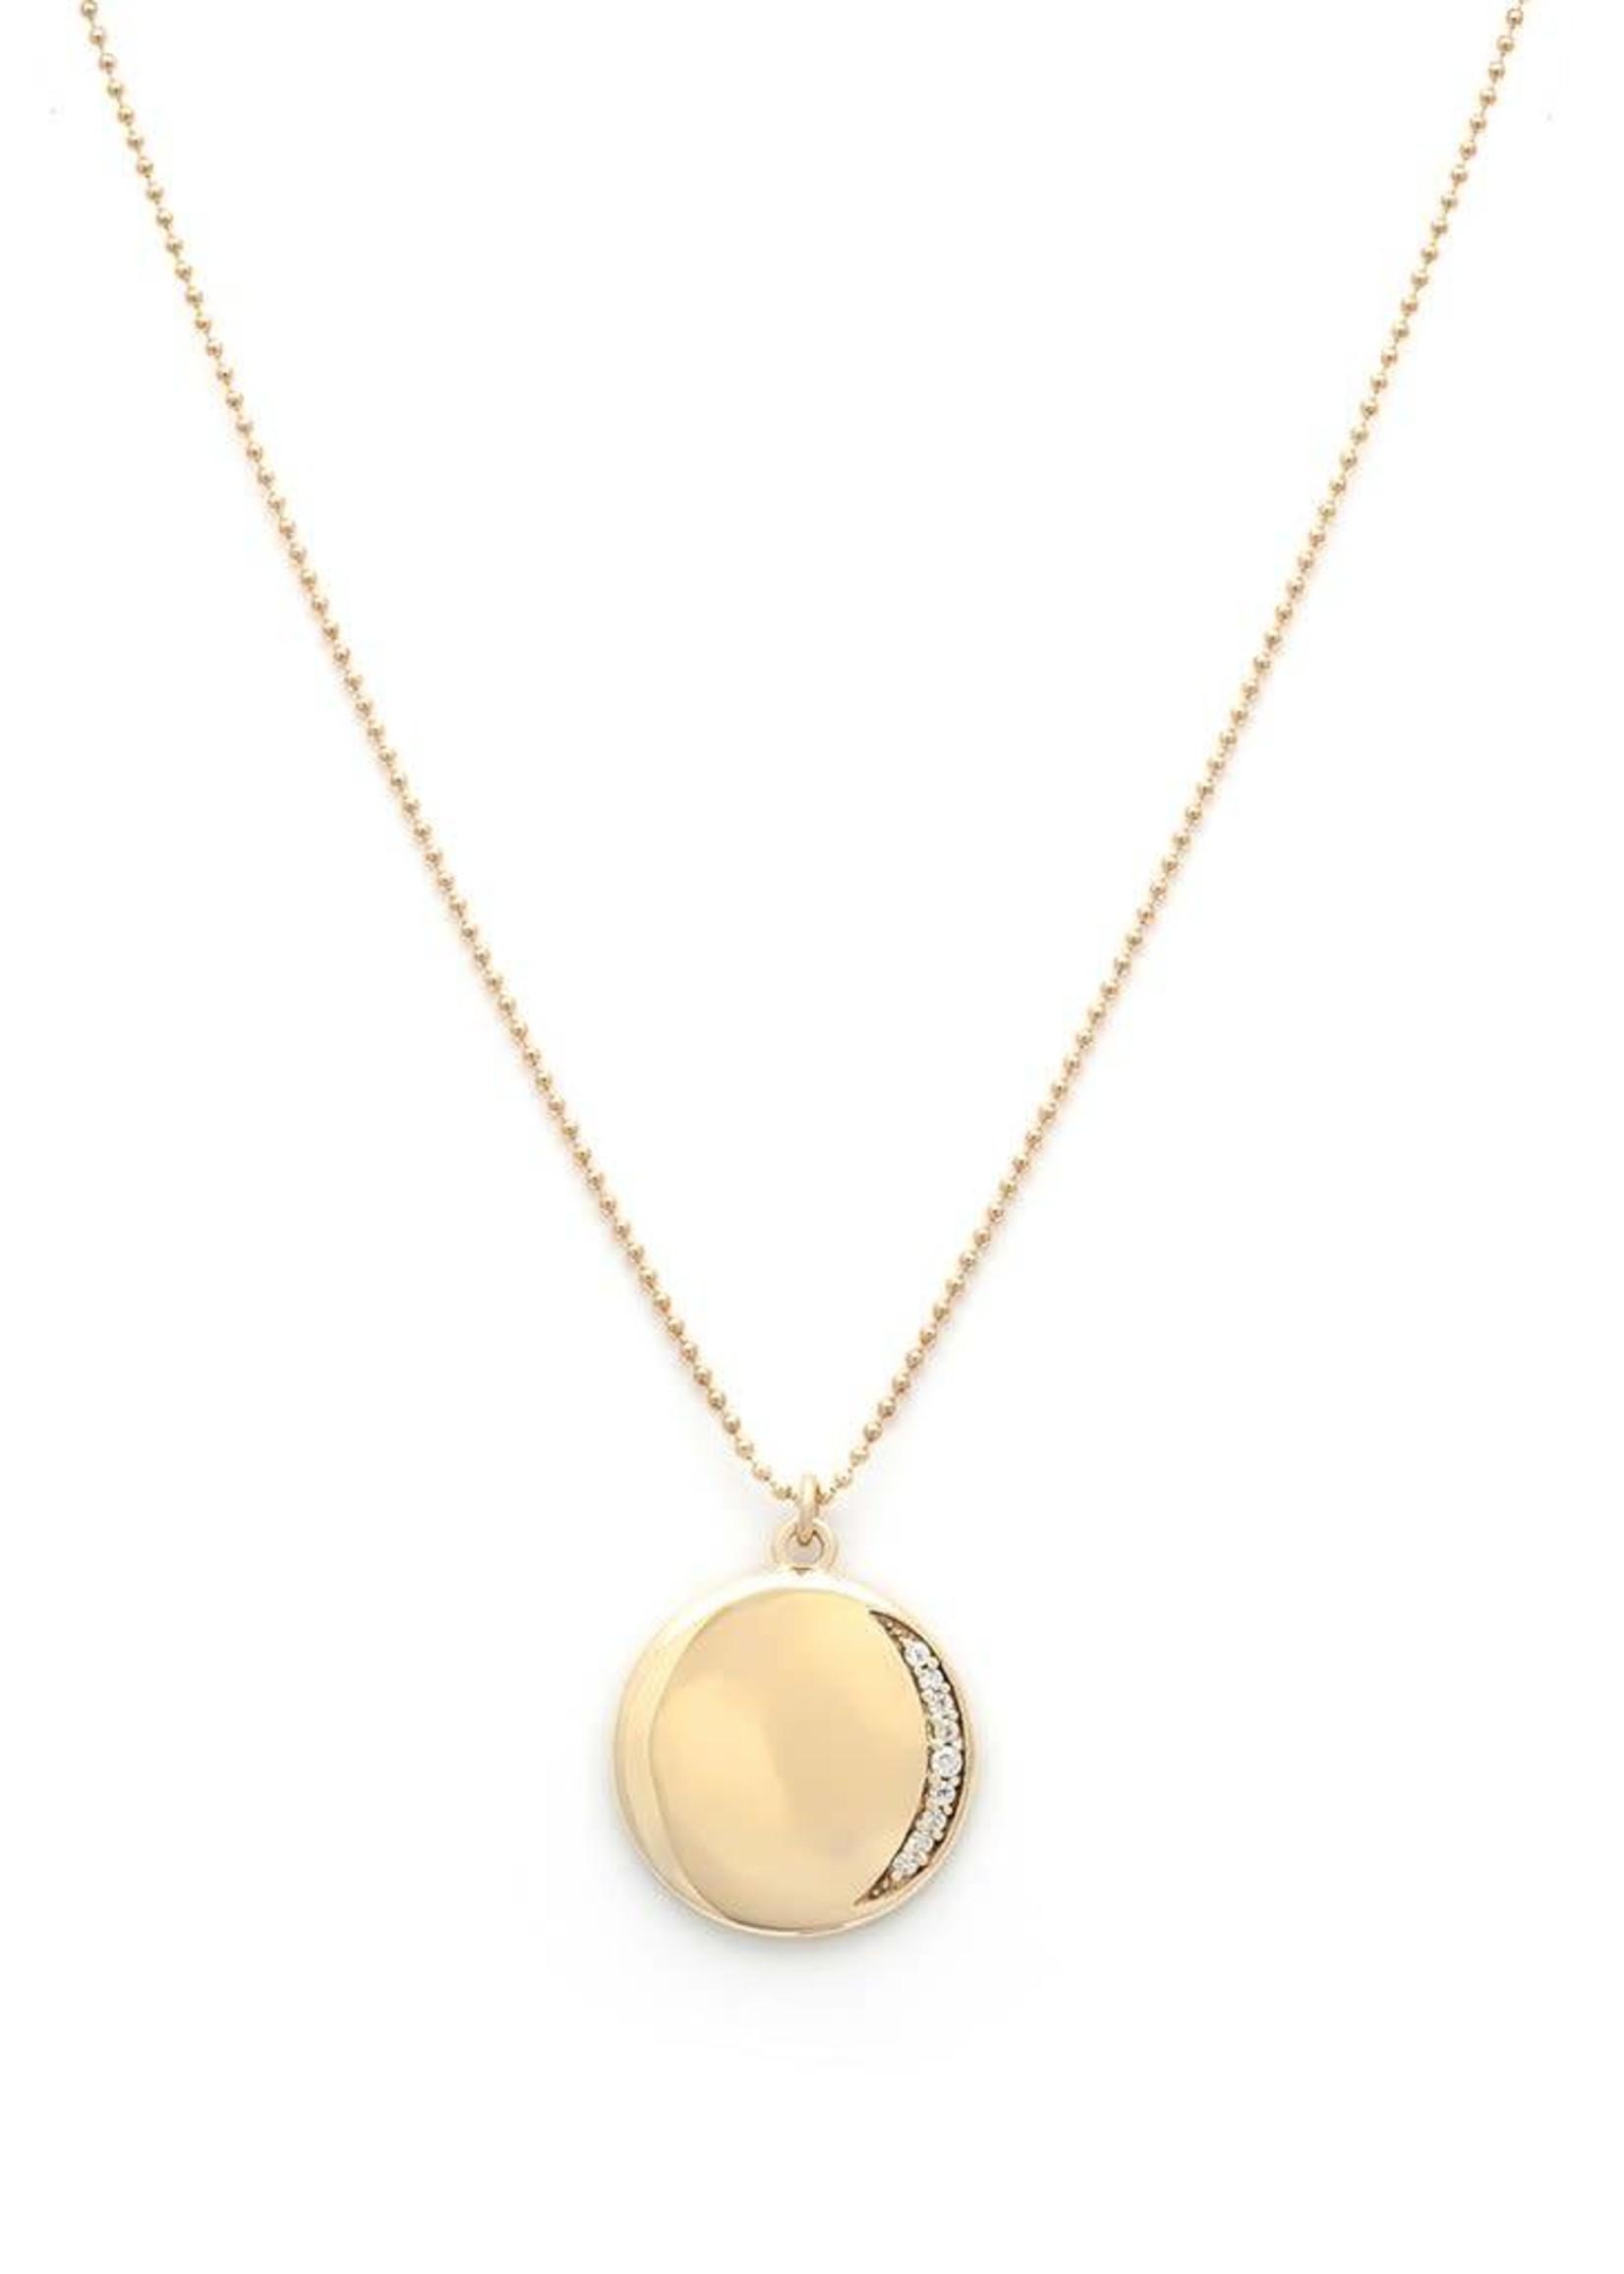 LEAH ALEXANDRA Leahlax ECLIPSE necklace, GOLD